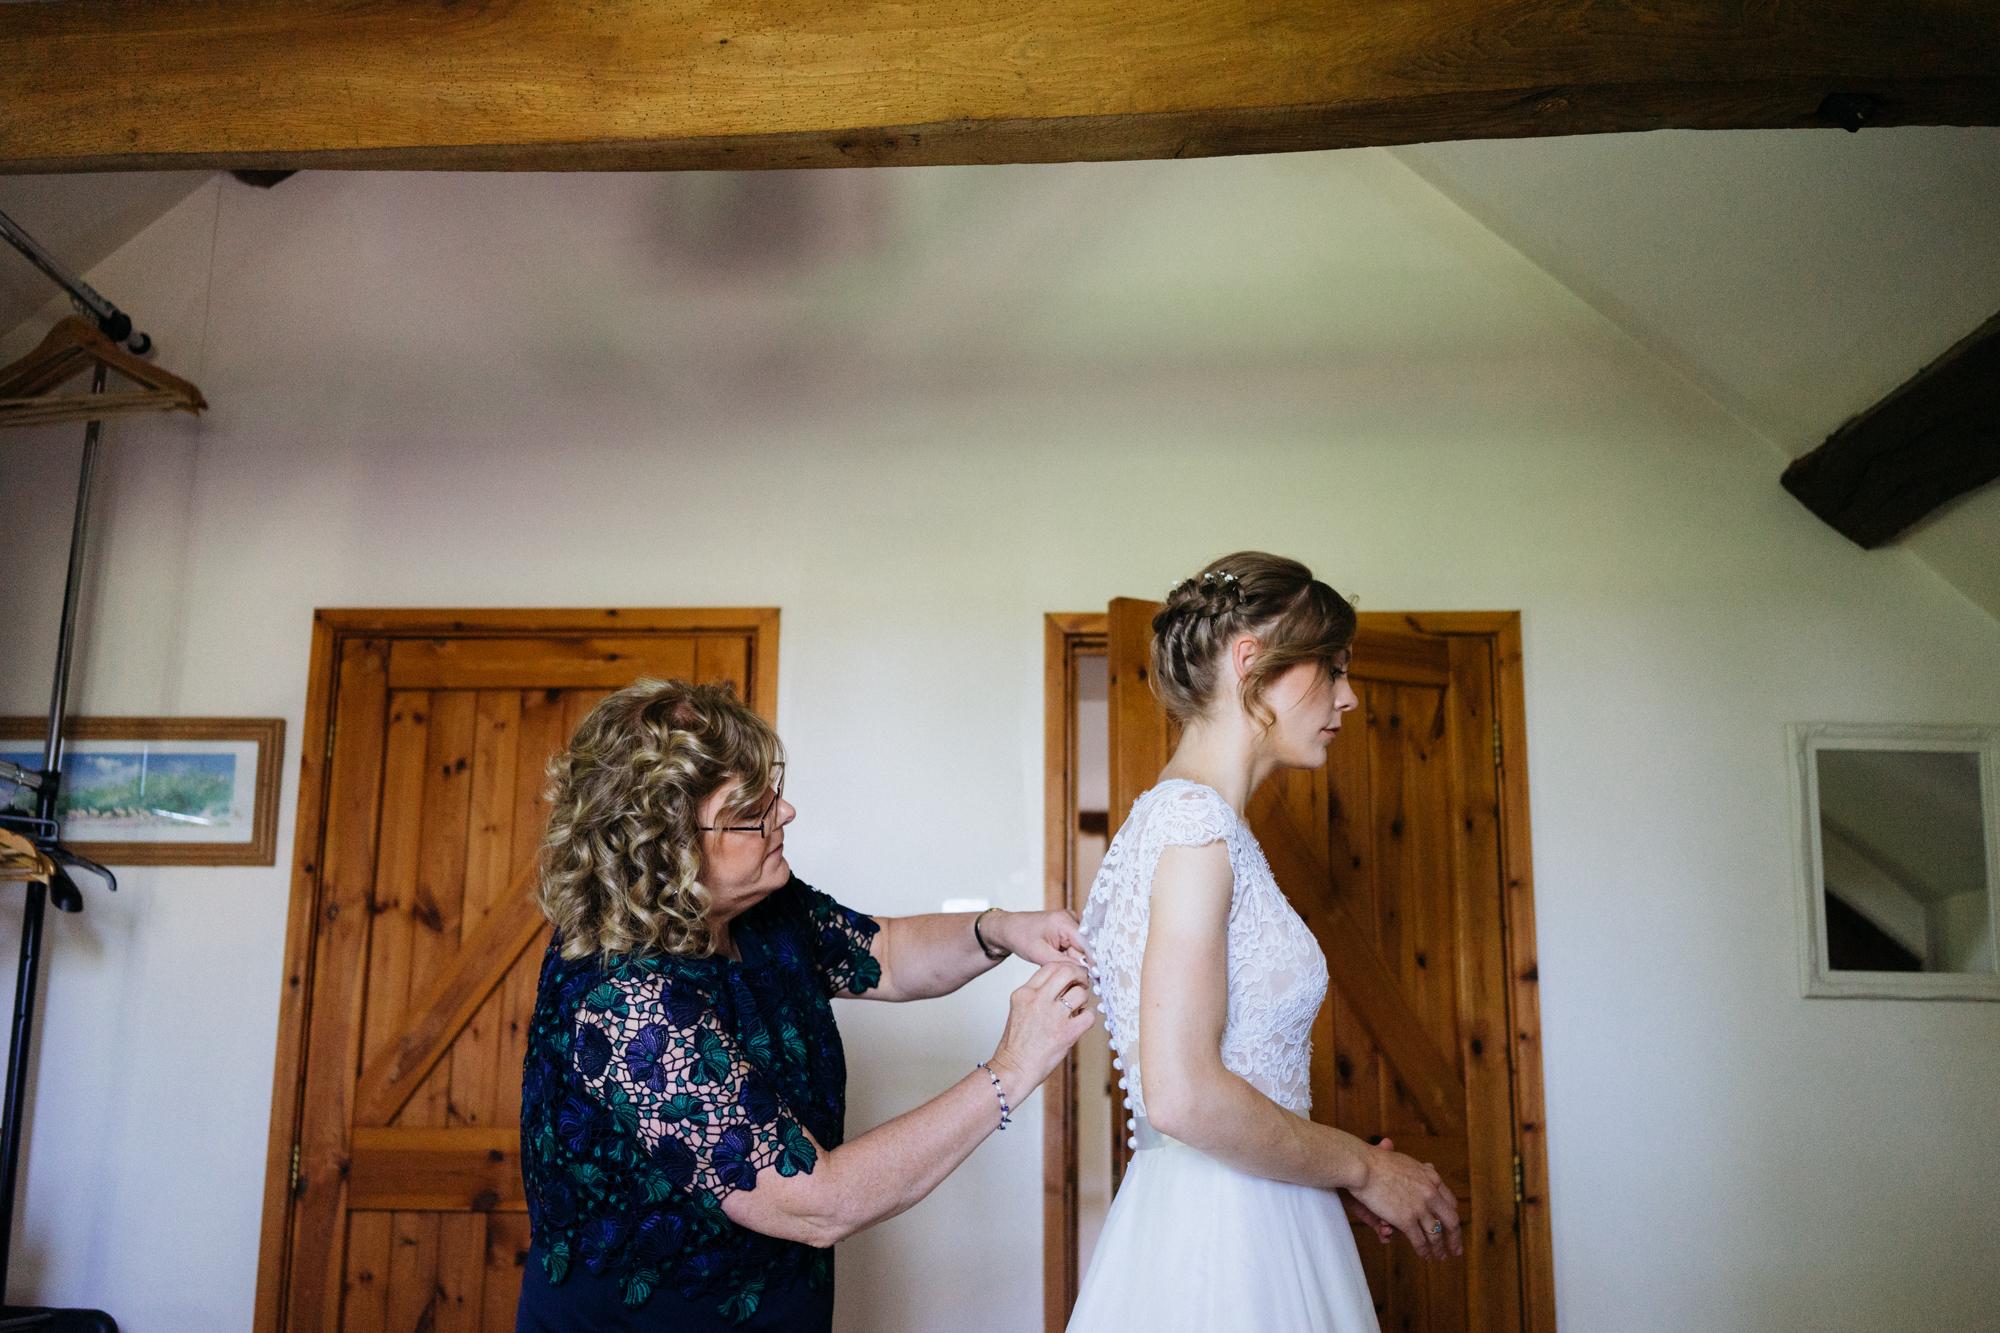 2019-09-21-Will&Ruth-Home-Wedding-64.jpg